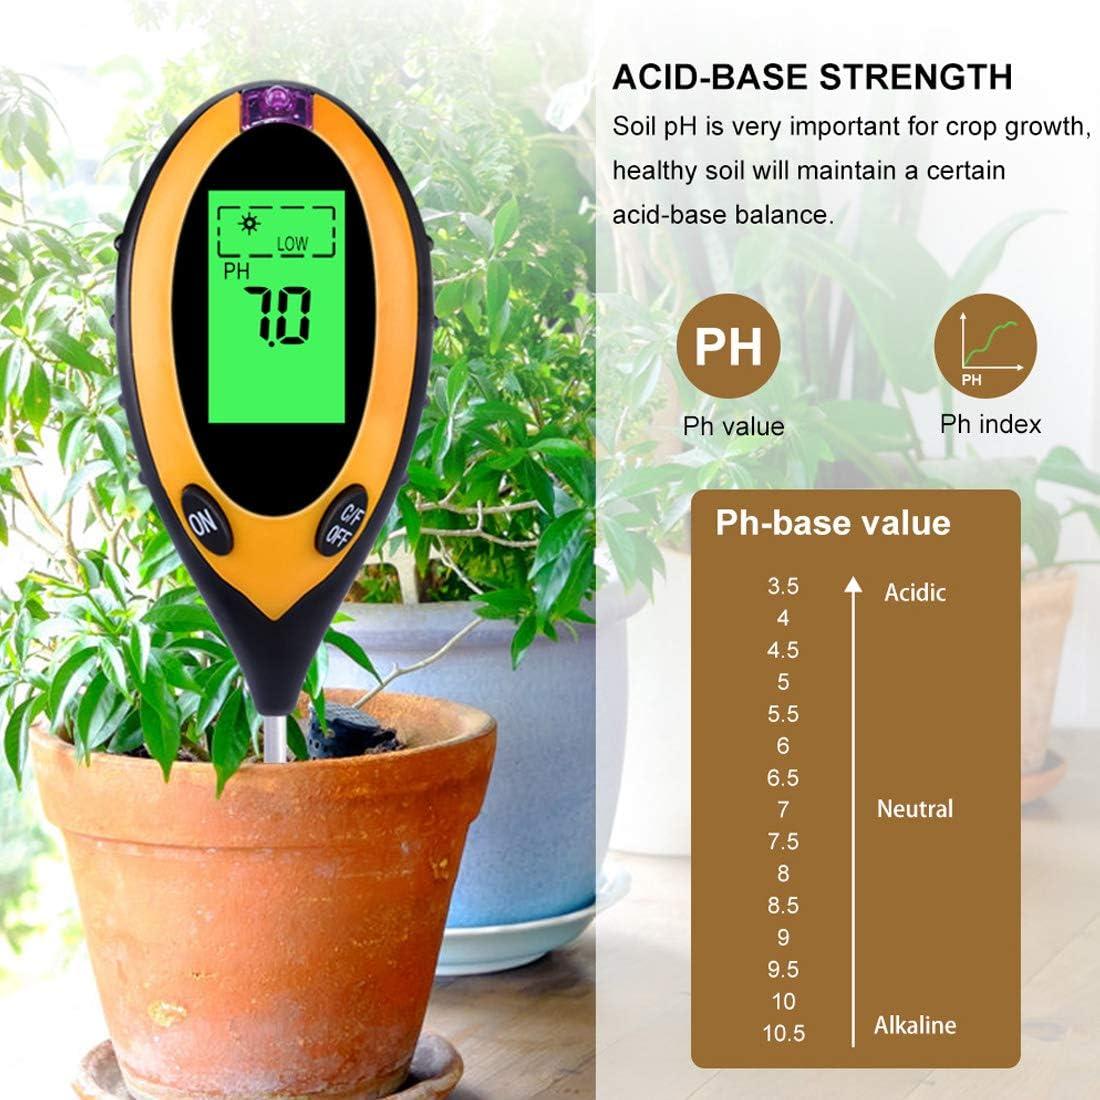 joyliveCY 4 in 1 Soil pH Instrument Moisture Meter Light and Moisture acidity Tester Soil Tester Kit Humidity Test Probe for Garden Farm Lawn Indoor Outdoor Plant Flower